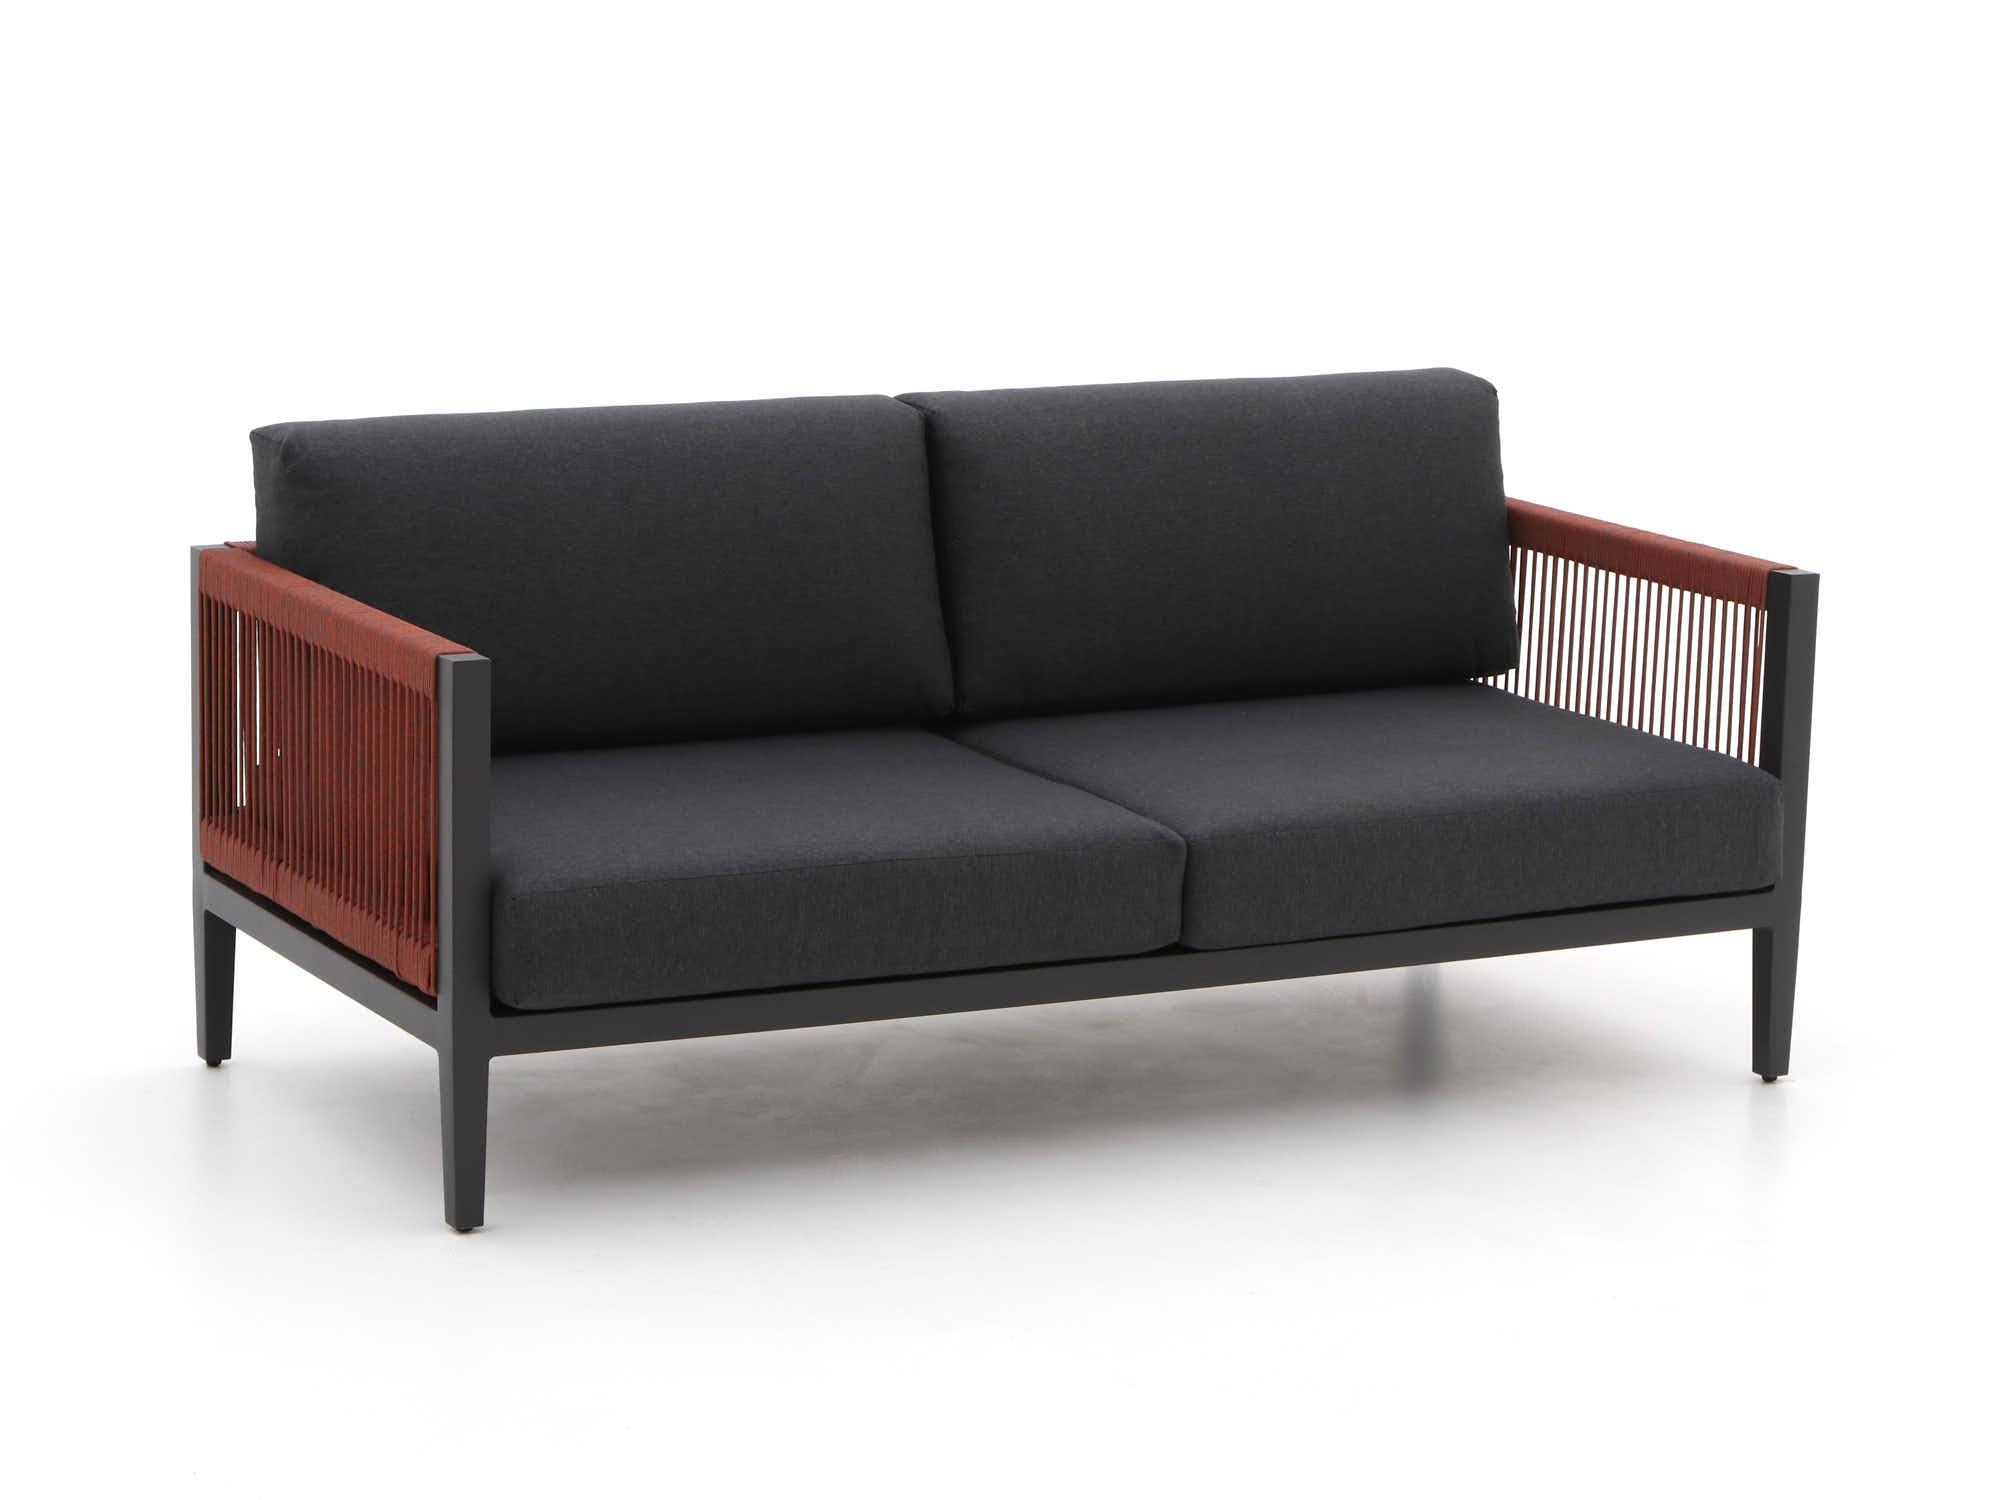 Manifesto Valero lounge tuinbank 2,5-zits 182cm - Laagste prijsgarantie!